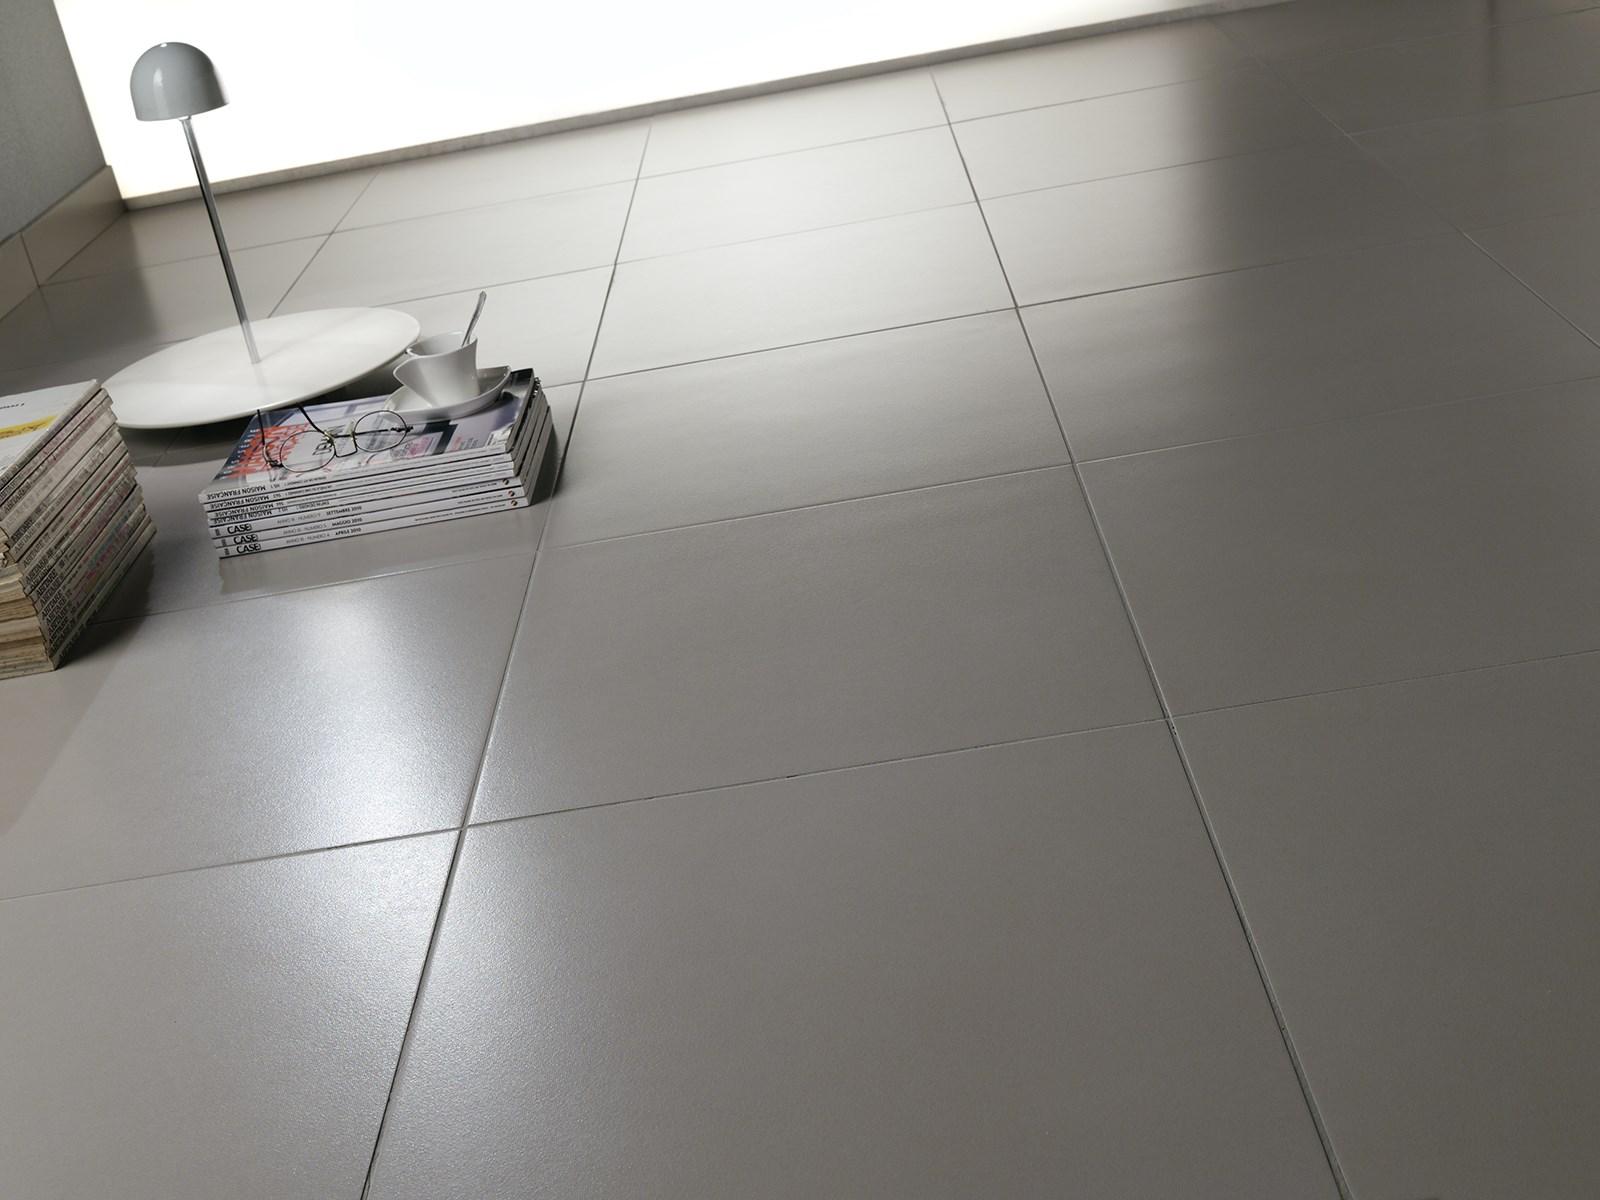 Carrelage 60x60 gris clair carrelage intarieur sol et for Carrelage wendel